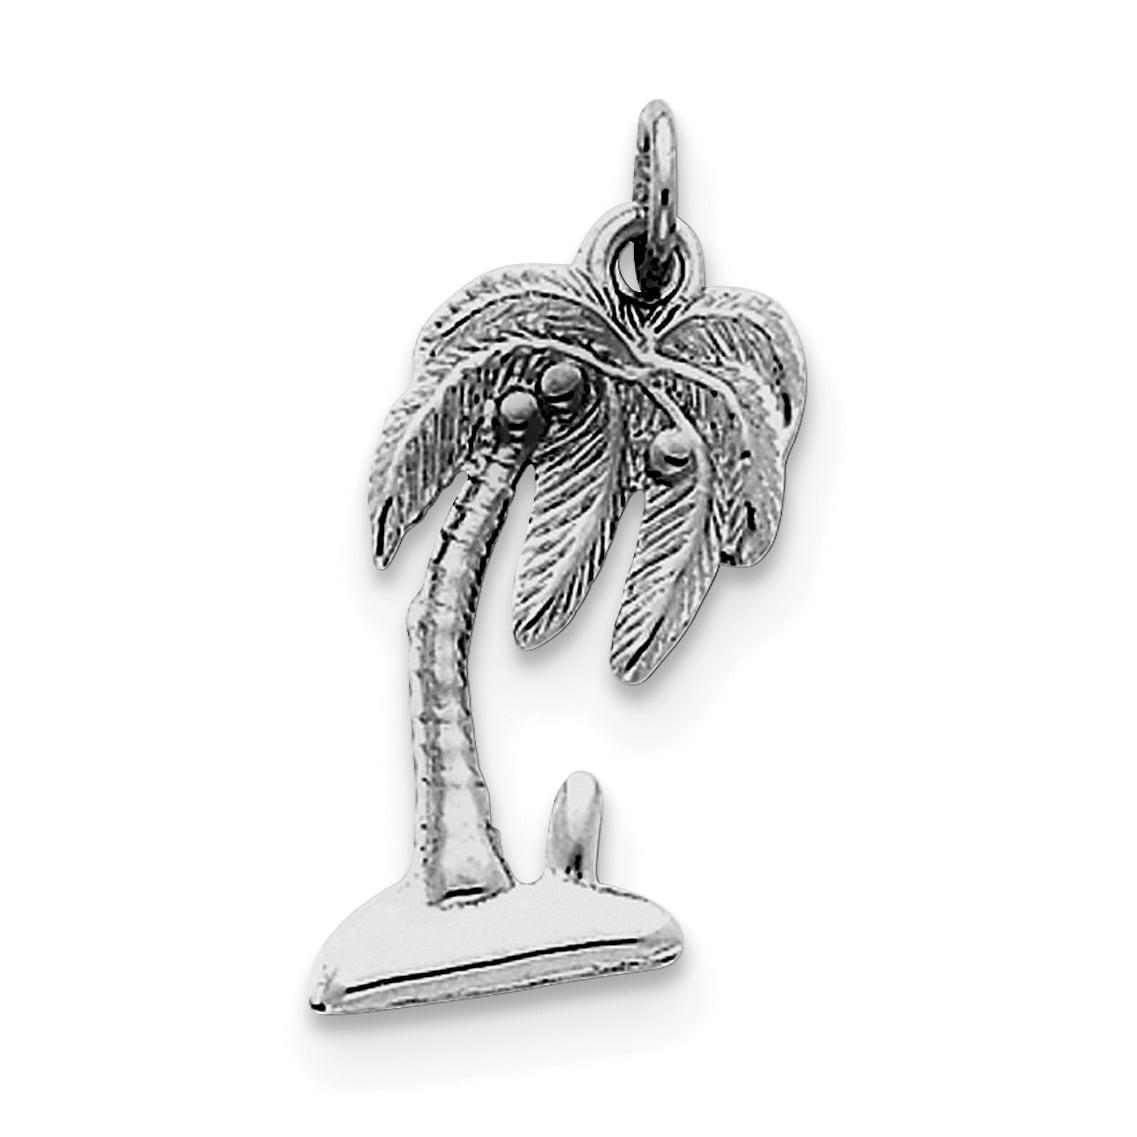 925 Sterling Silver Palm Tree Charm Pendant 25mm x 13mm